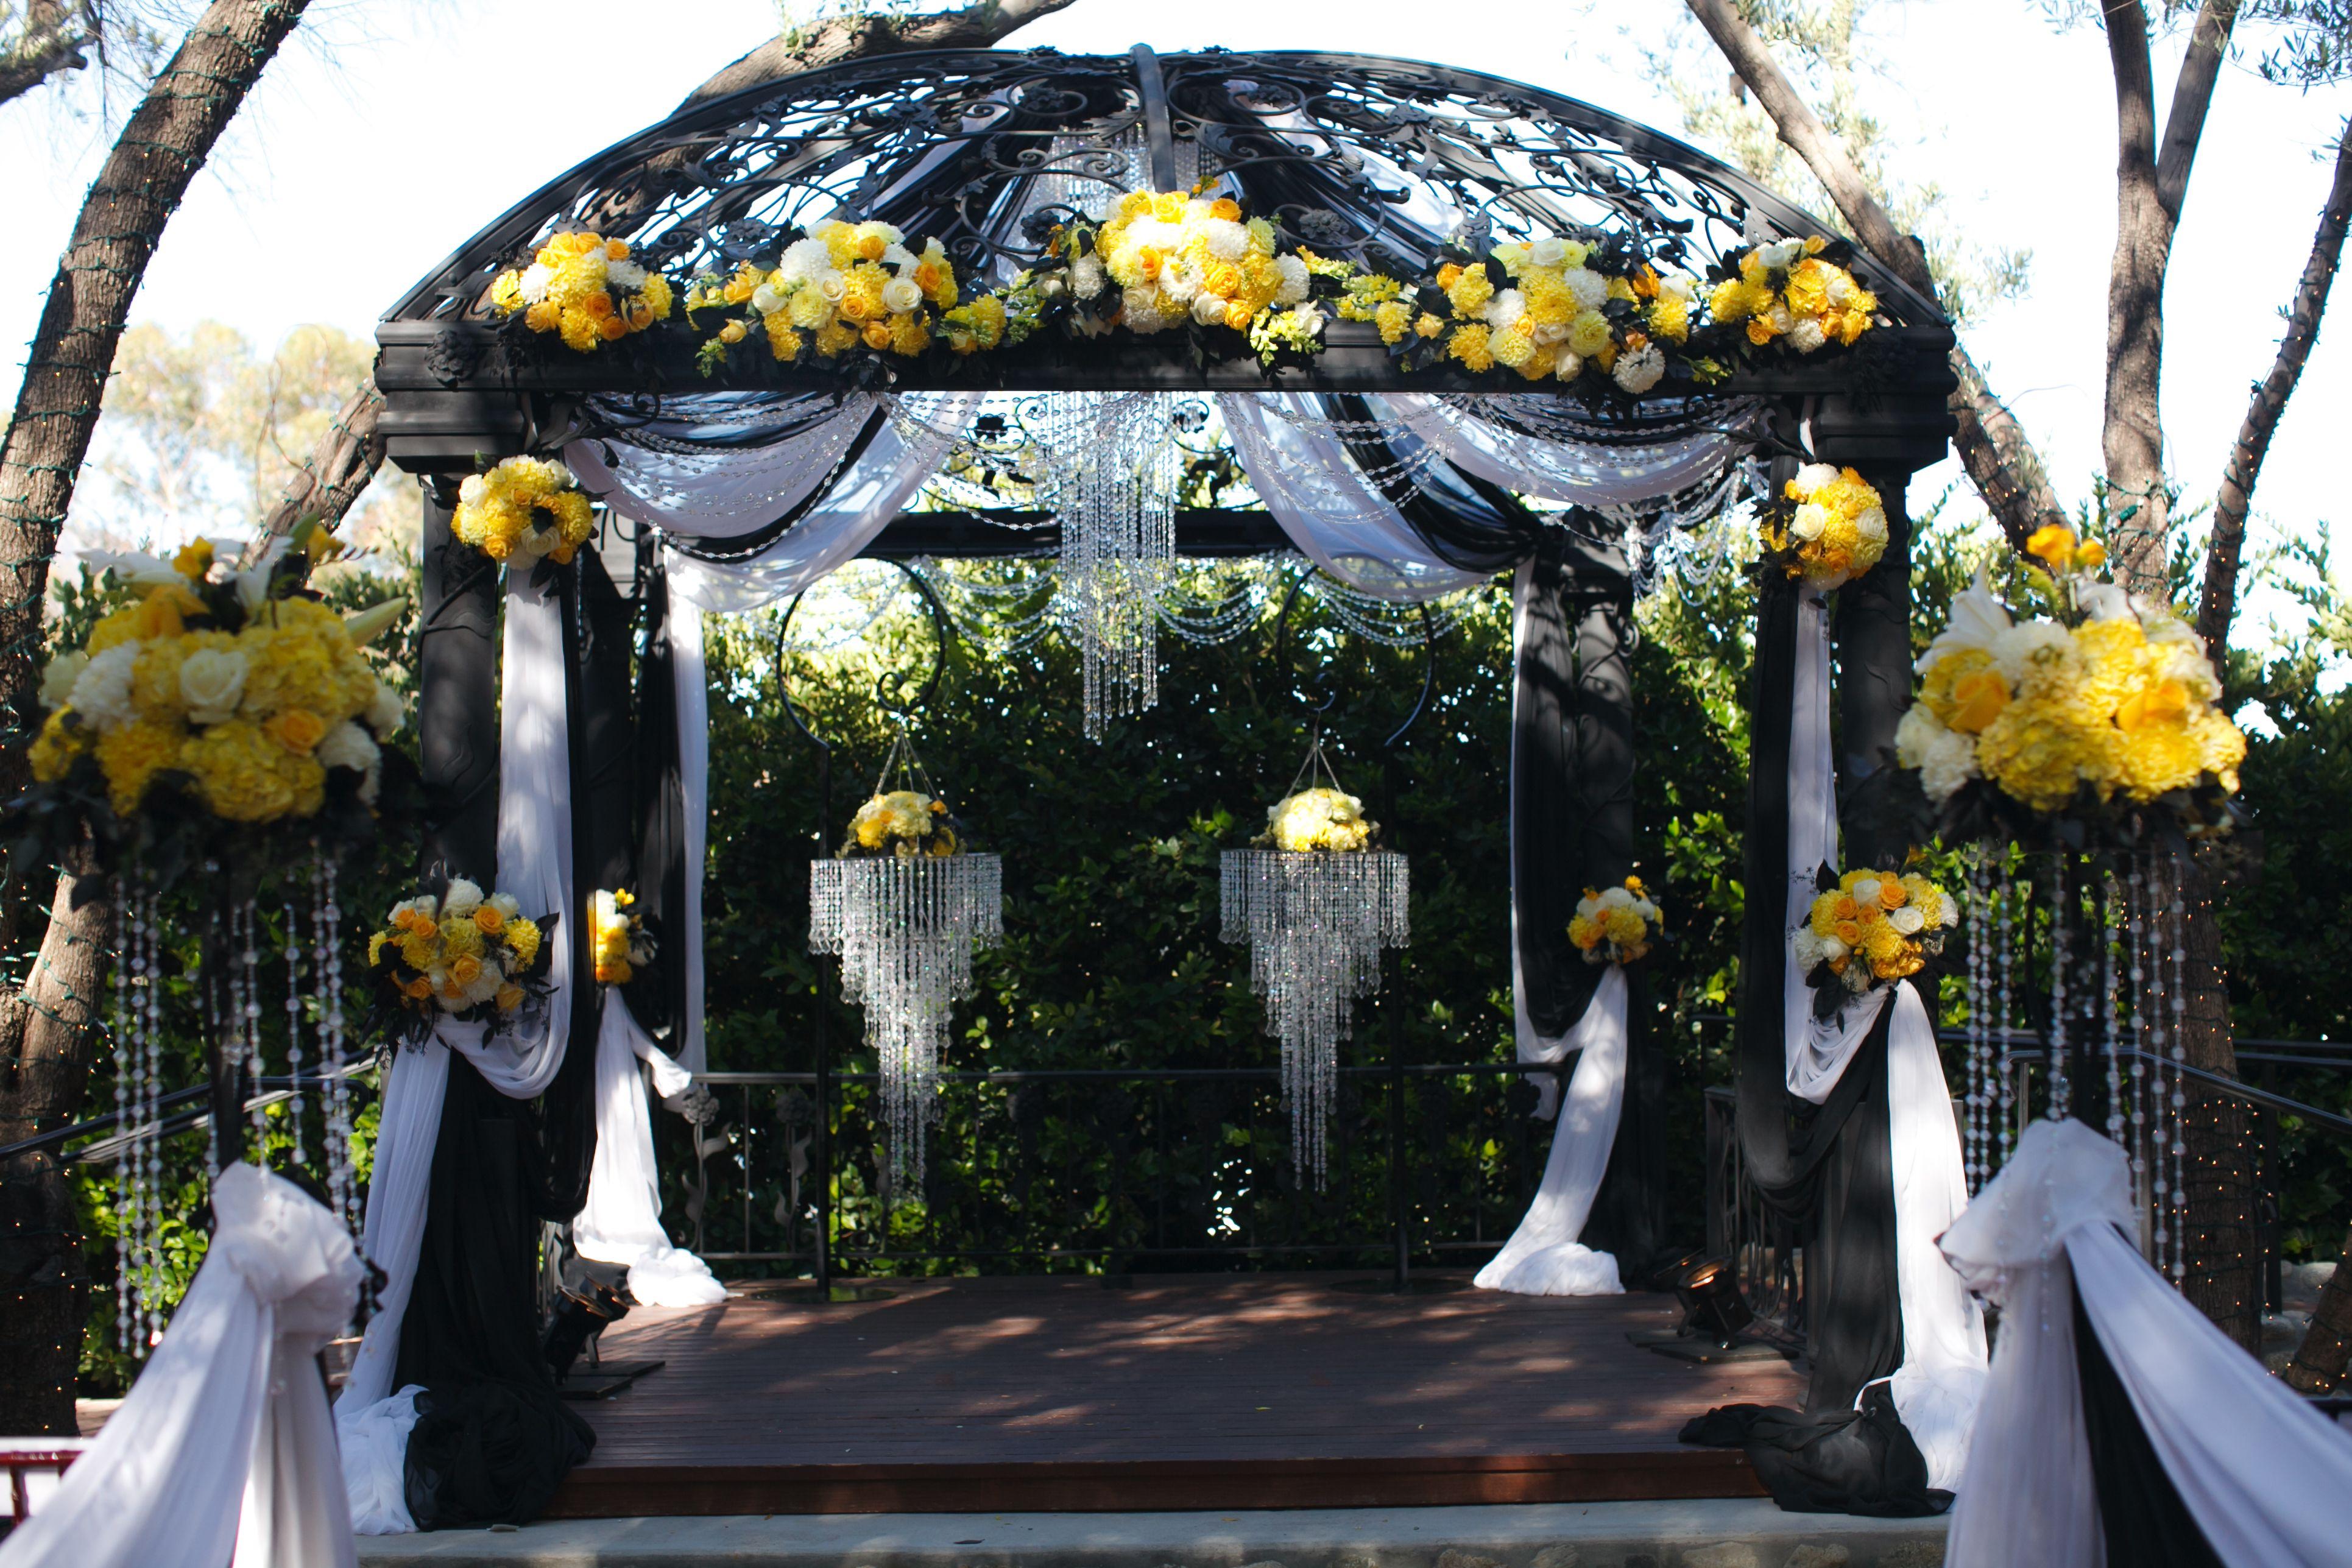 Southern California Weddings Outdoor Gazebo Ceremony at